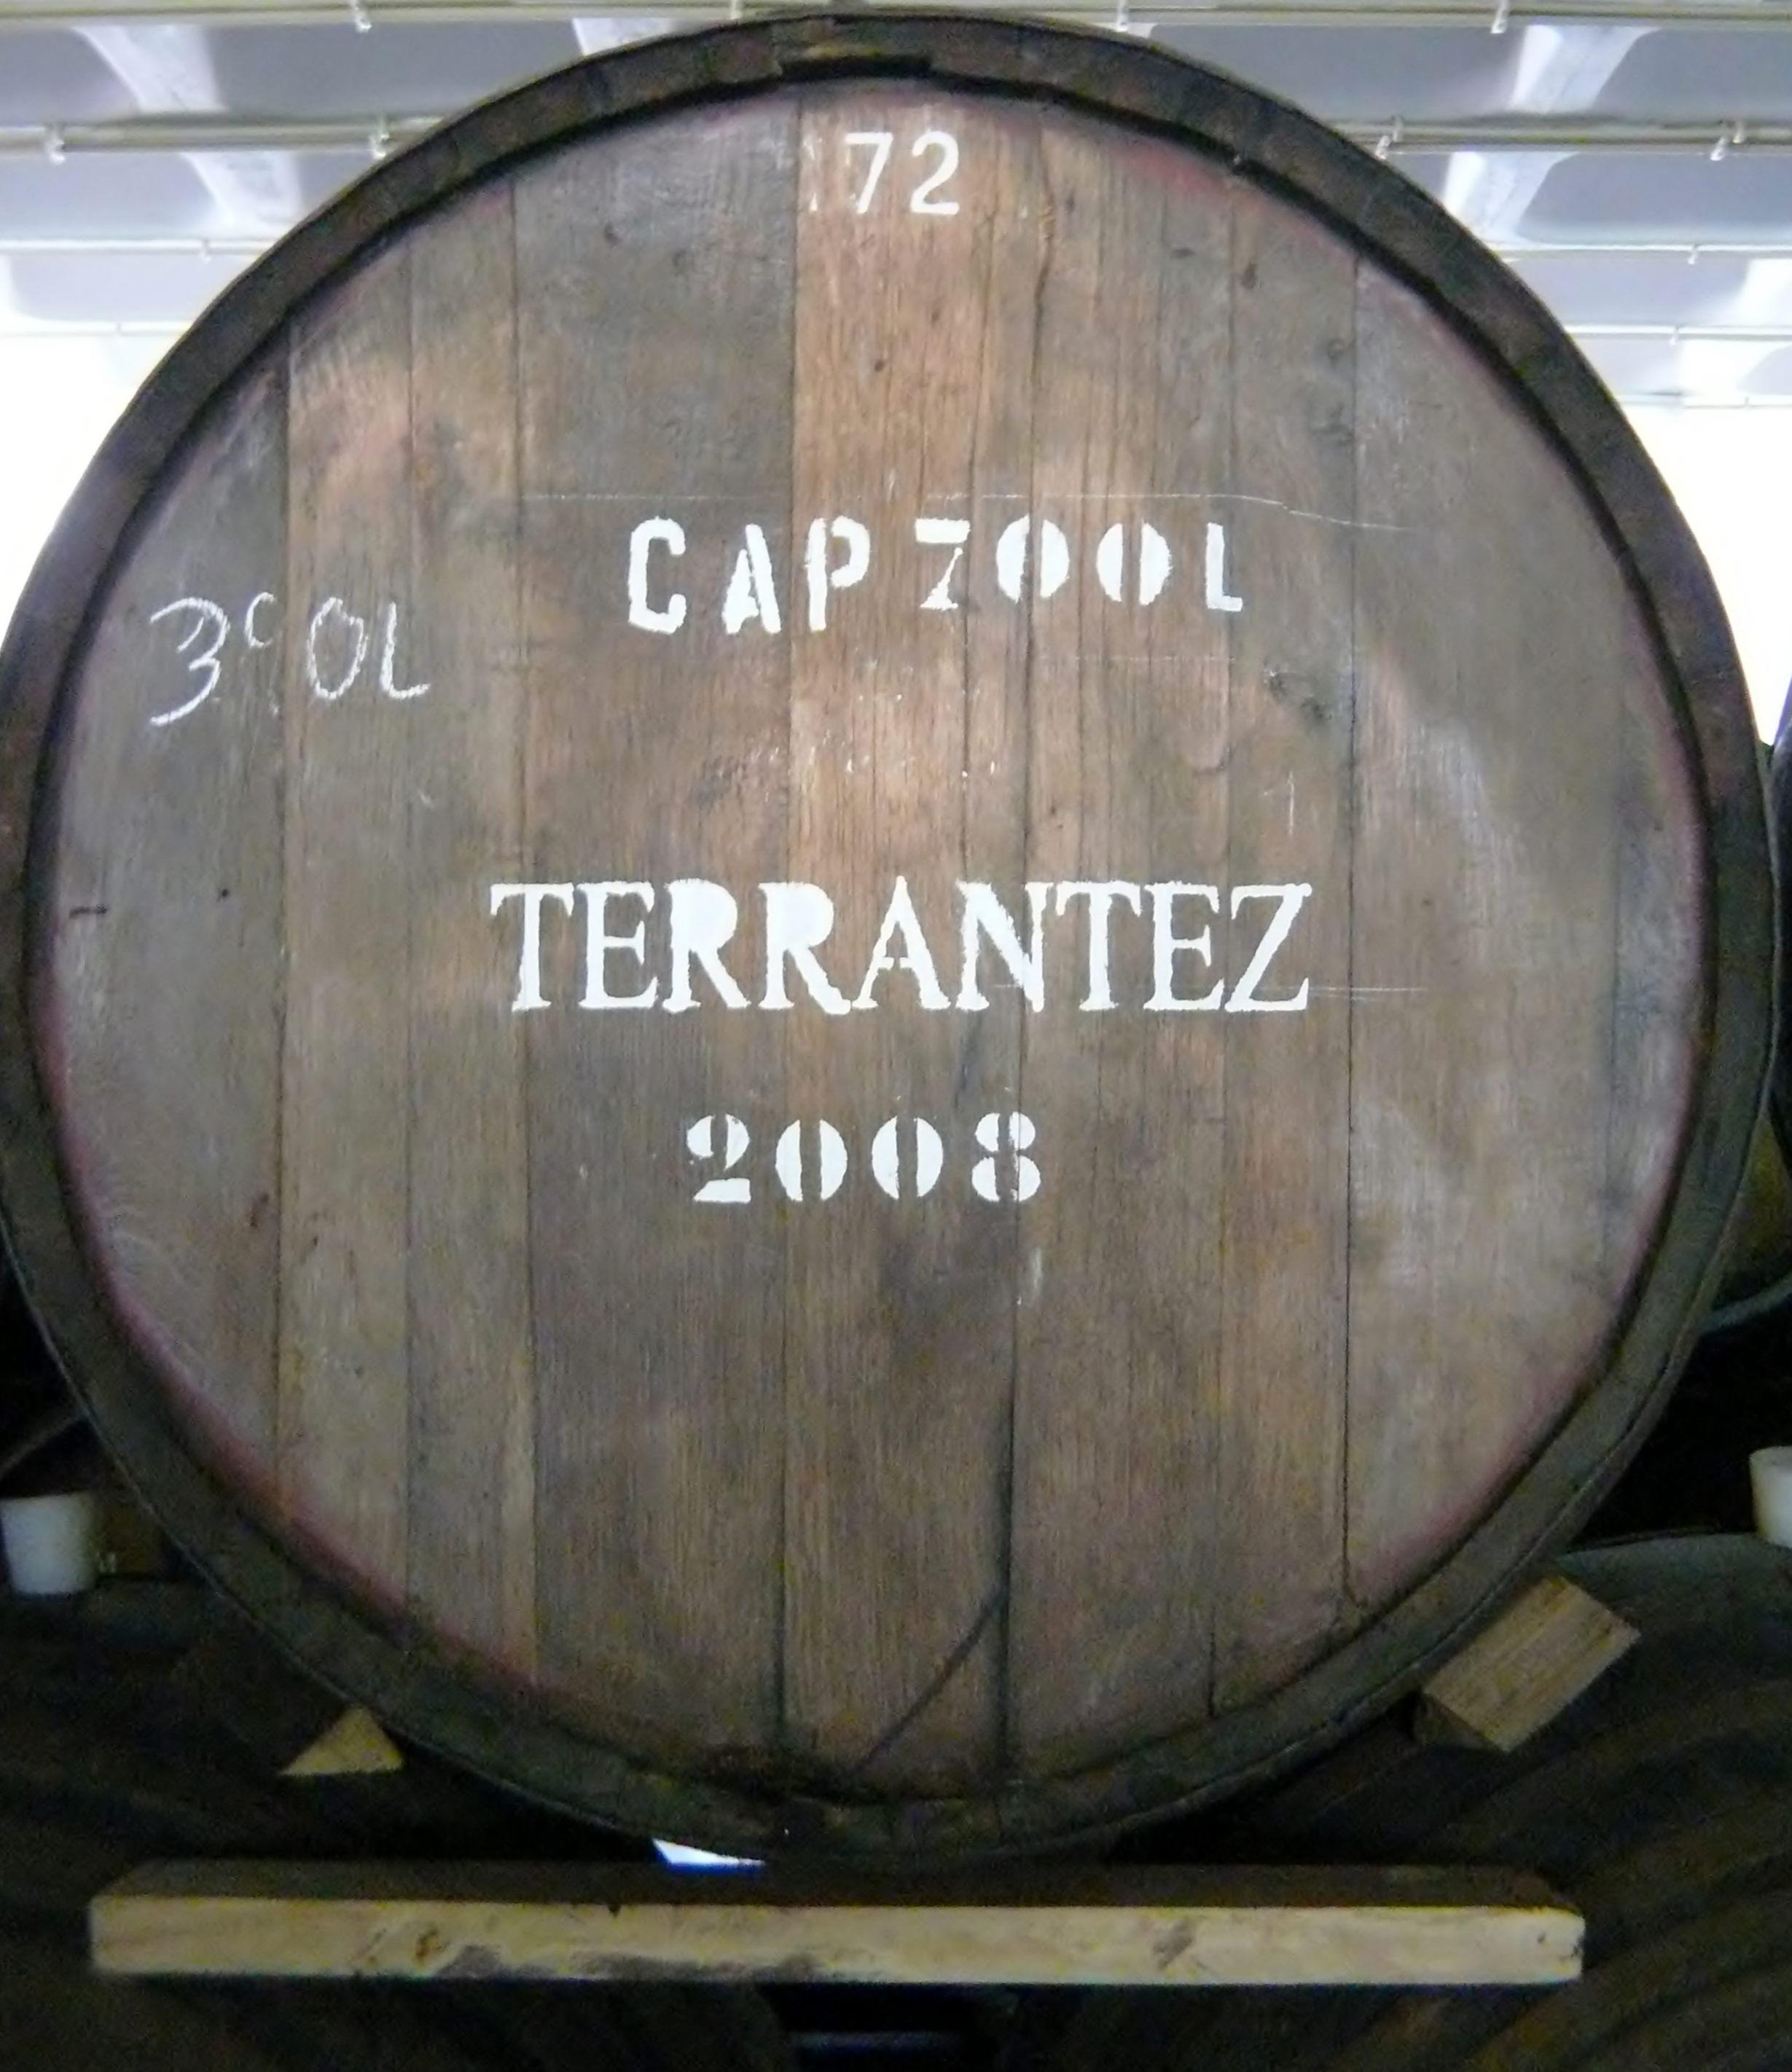 Terrantez